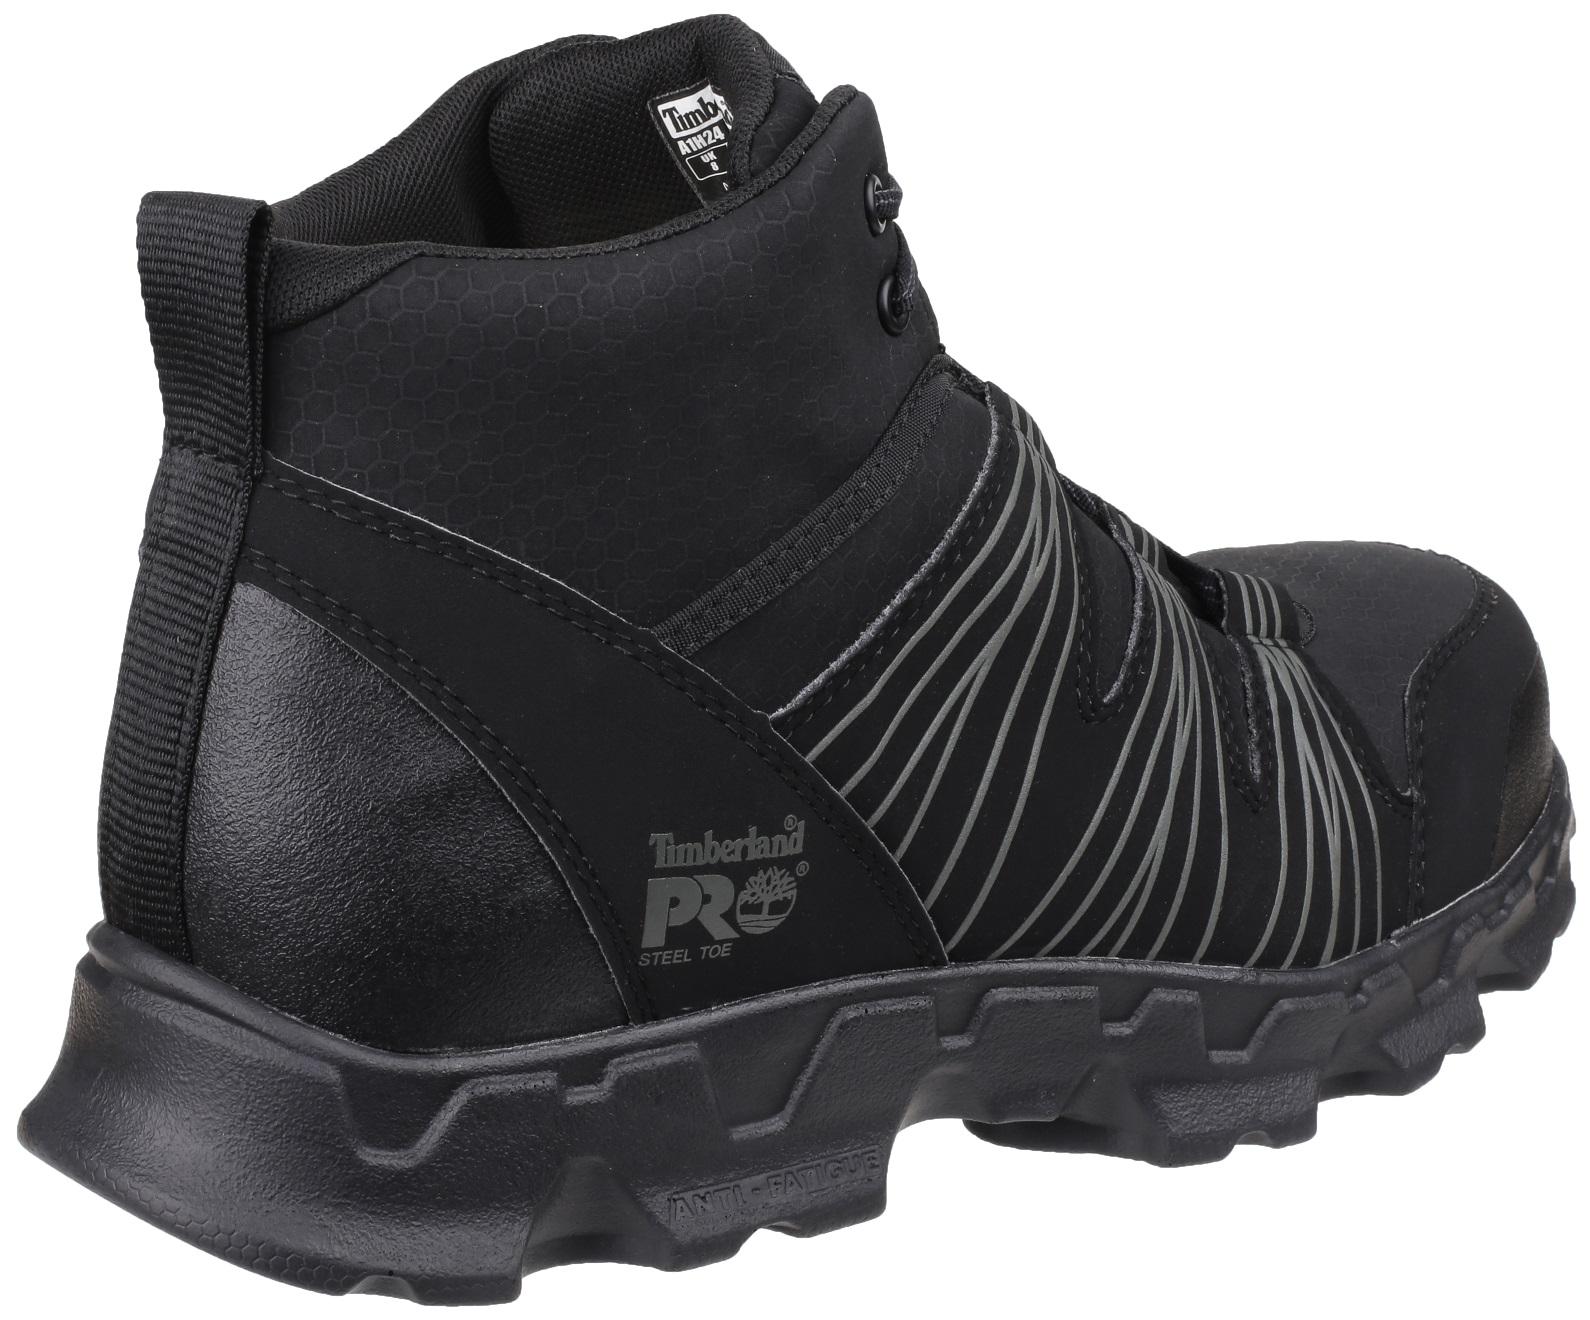 Timberland Pro Powertrain Mid Safety Work Boots Black Anti